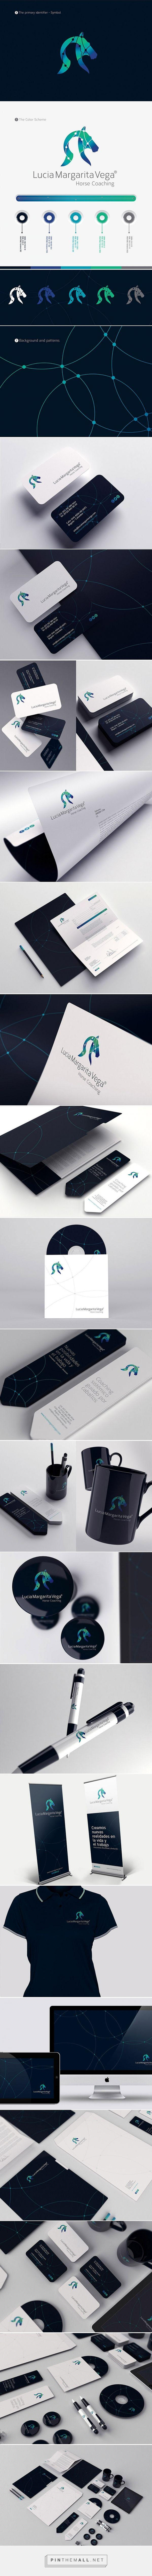 LMV - Logo and Identity by David Espinosa IDS